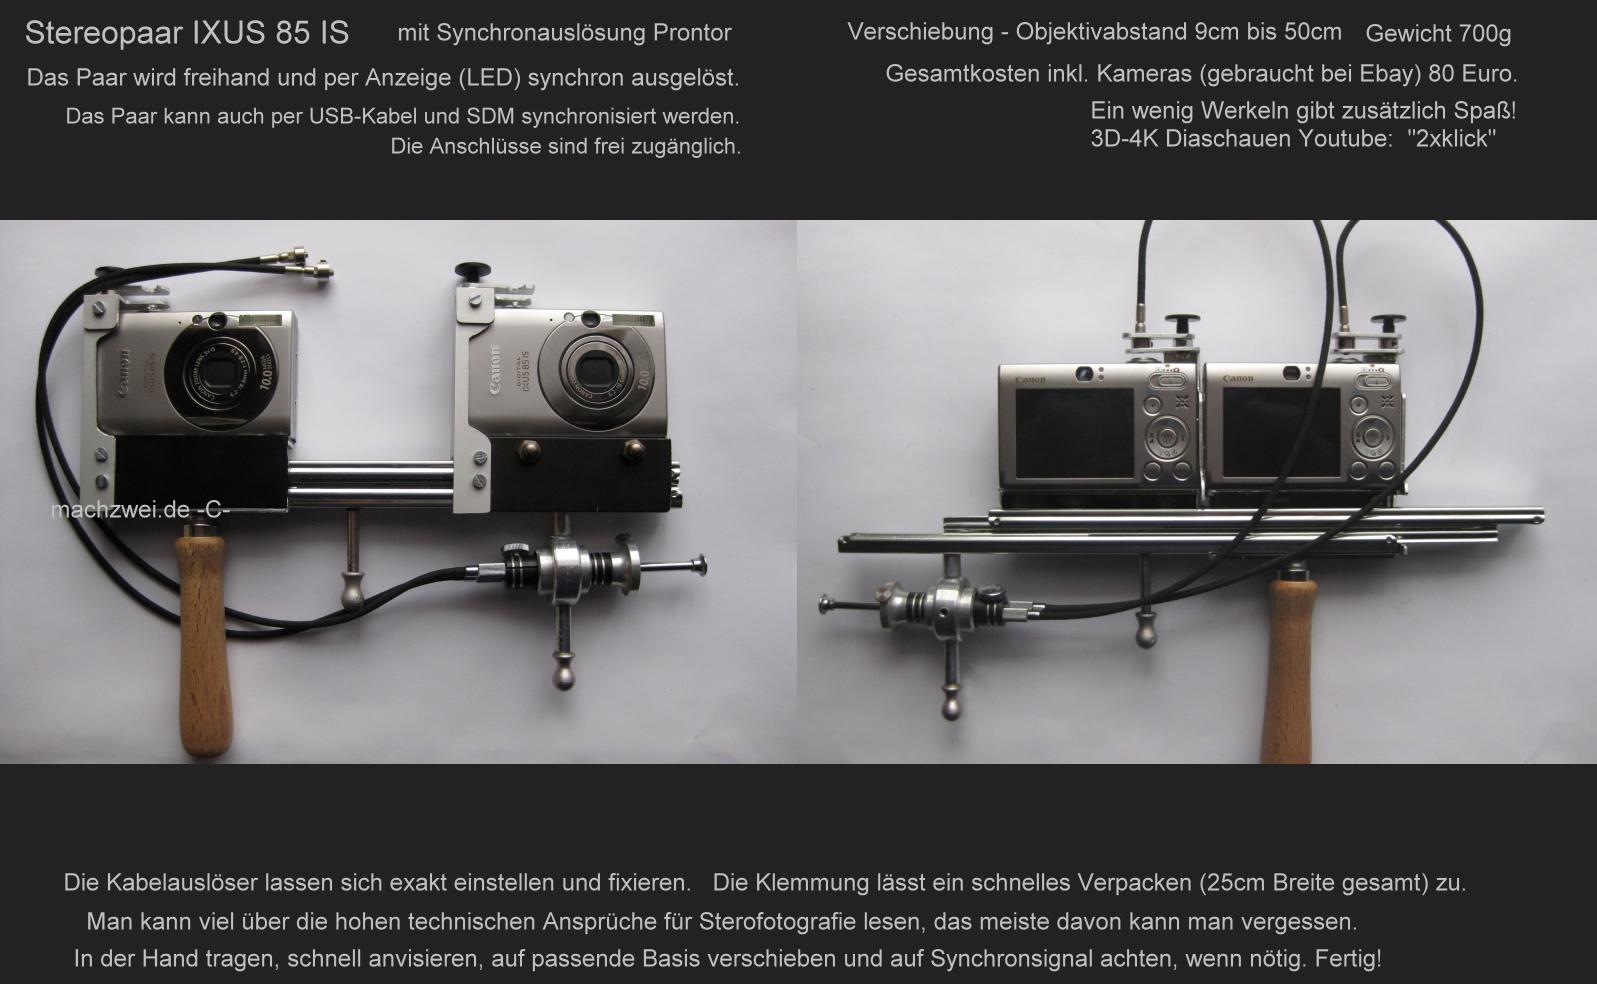 Stereokamera Selbstbau  2x Ixus 85IS